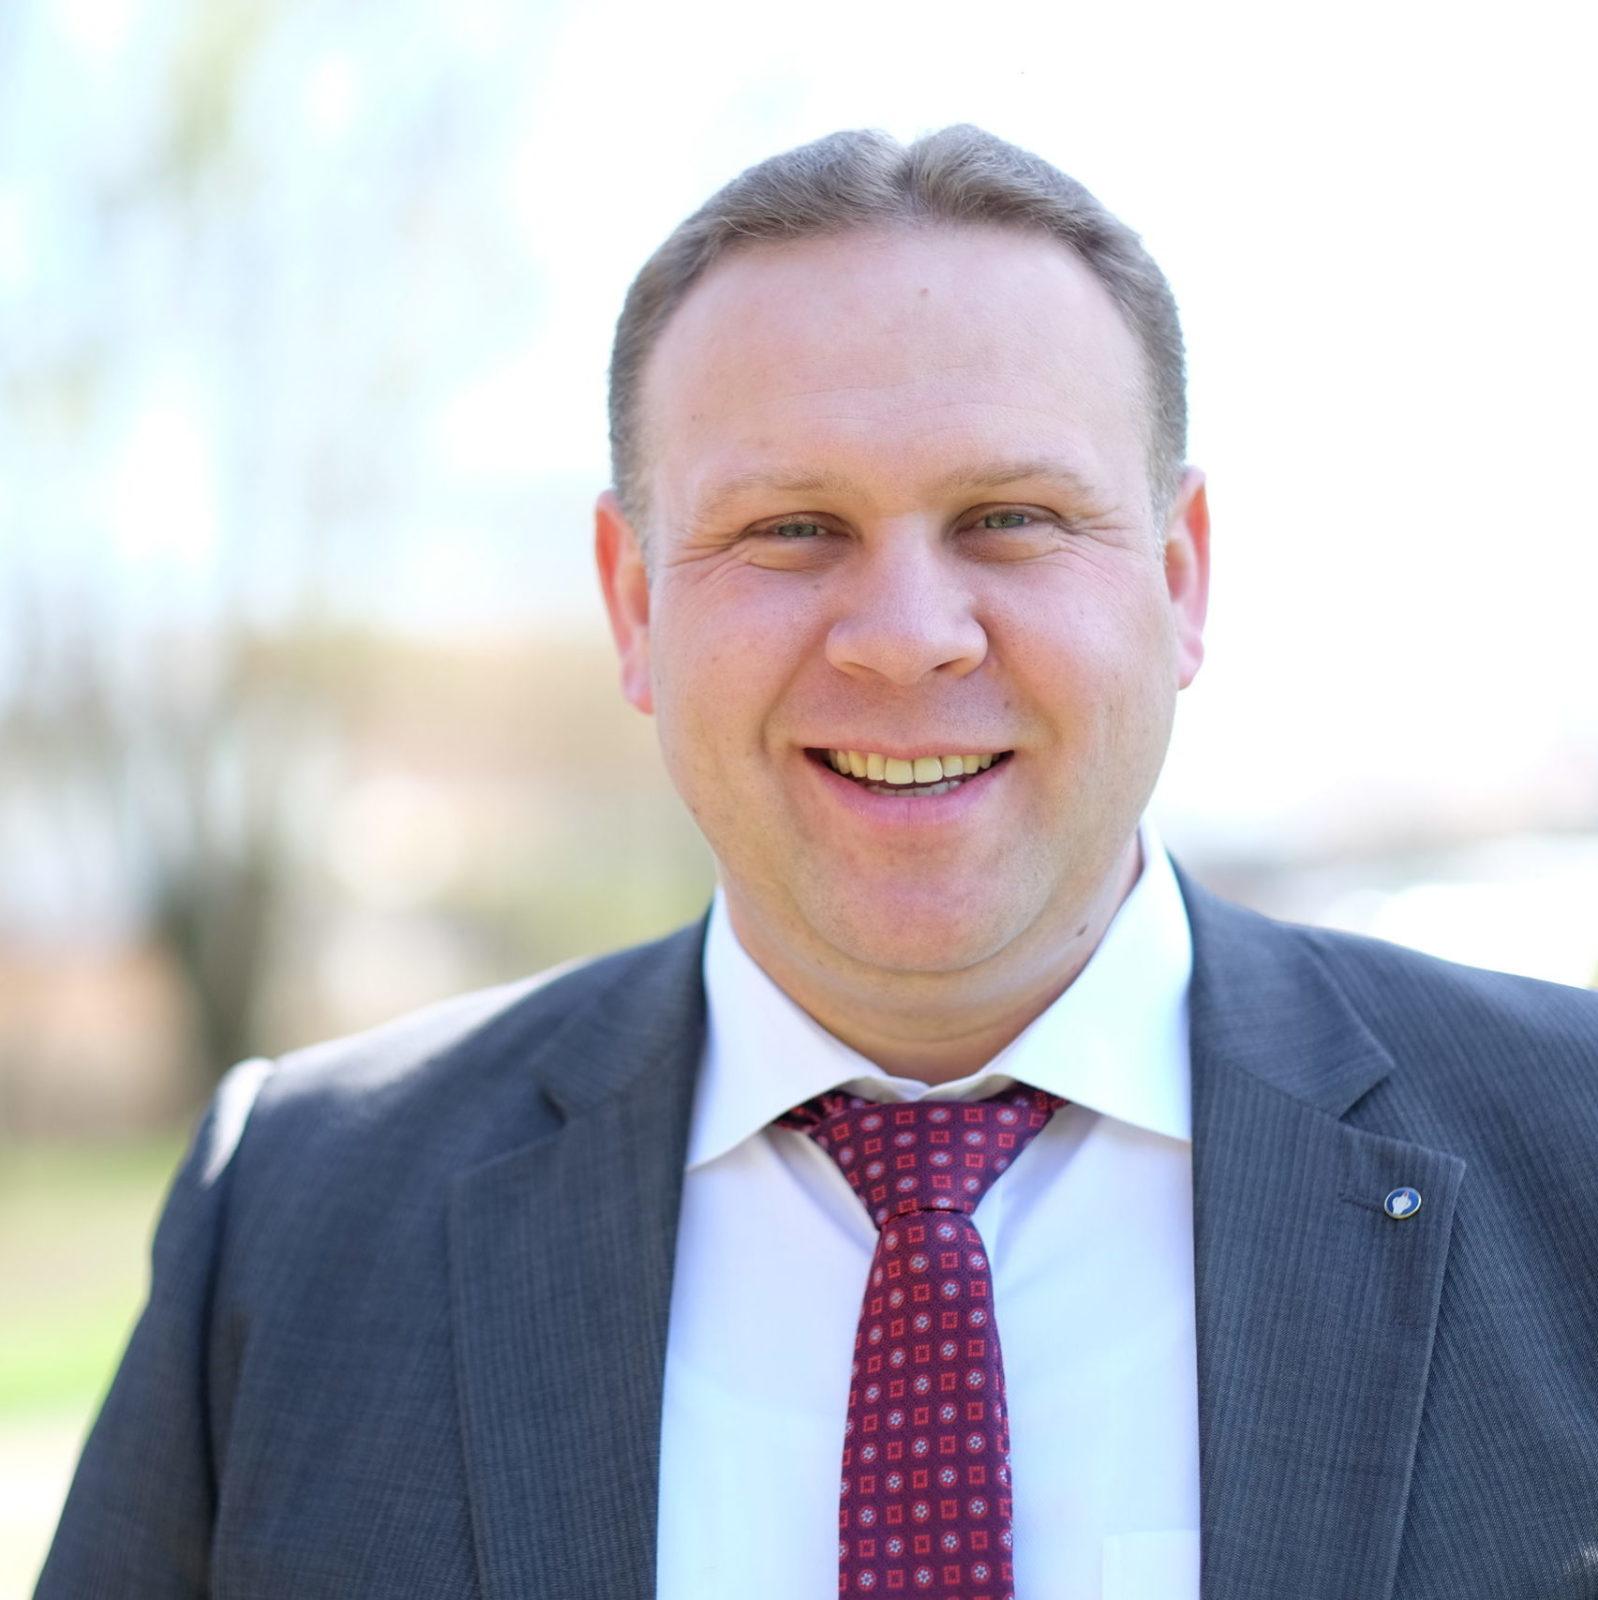 Johann Renpening - preisdruck24.com